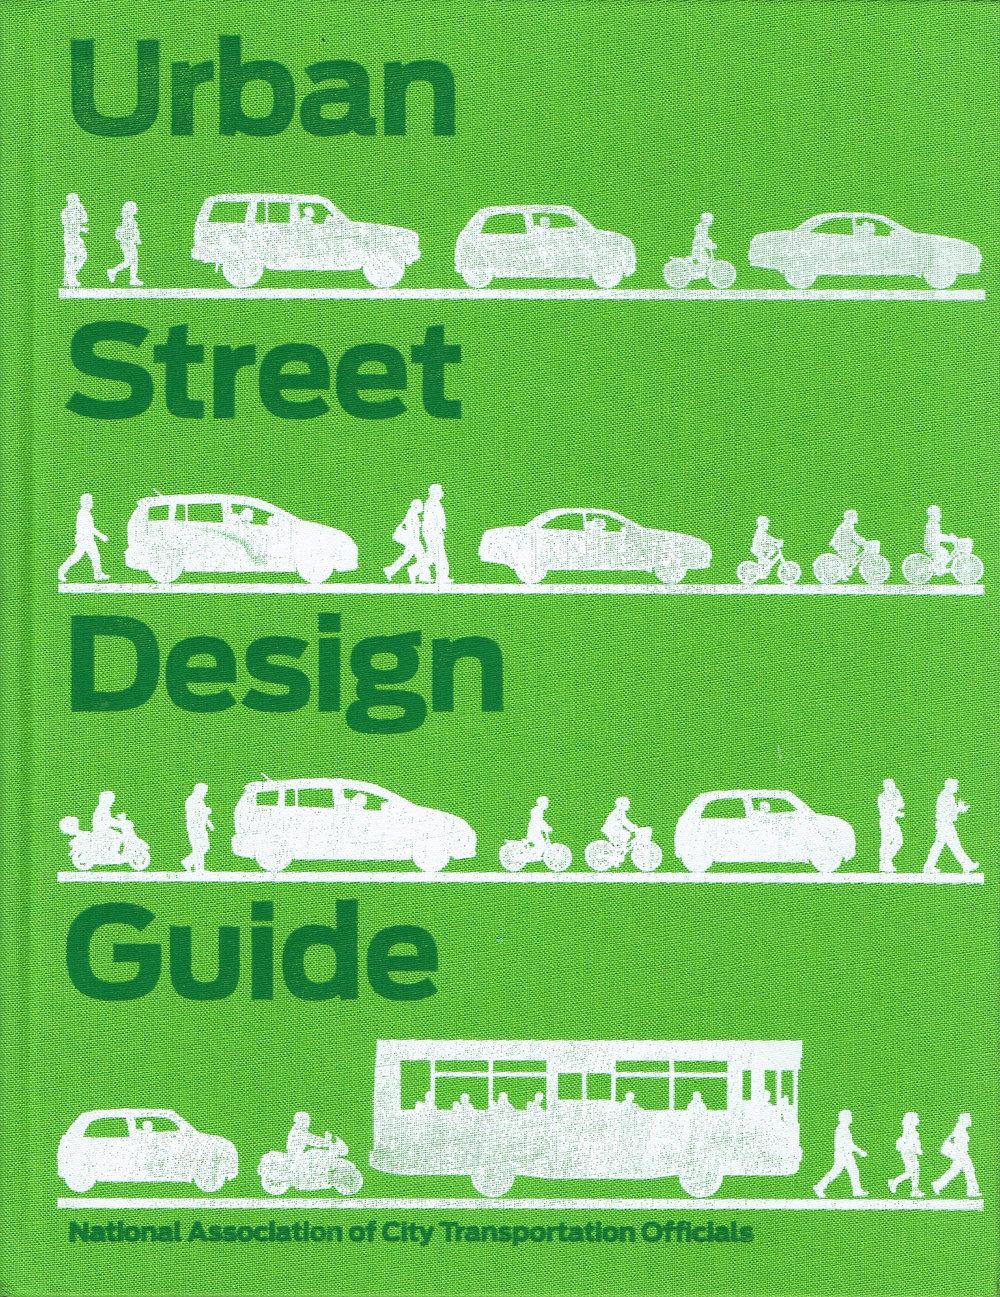 Urban street design guide   National Association of City Transportation Officials.